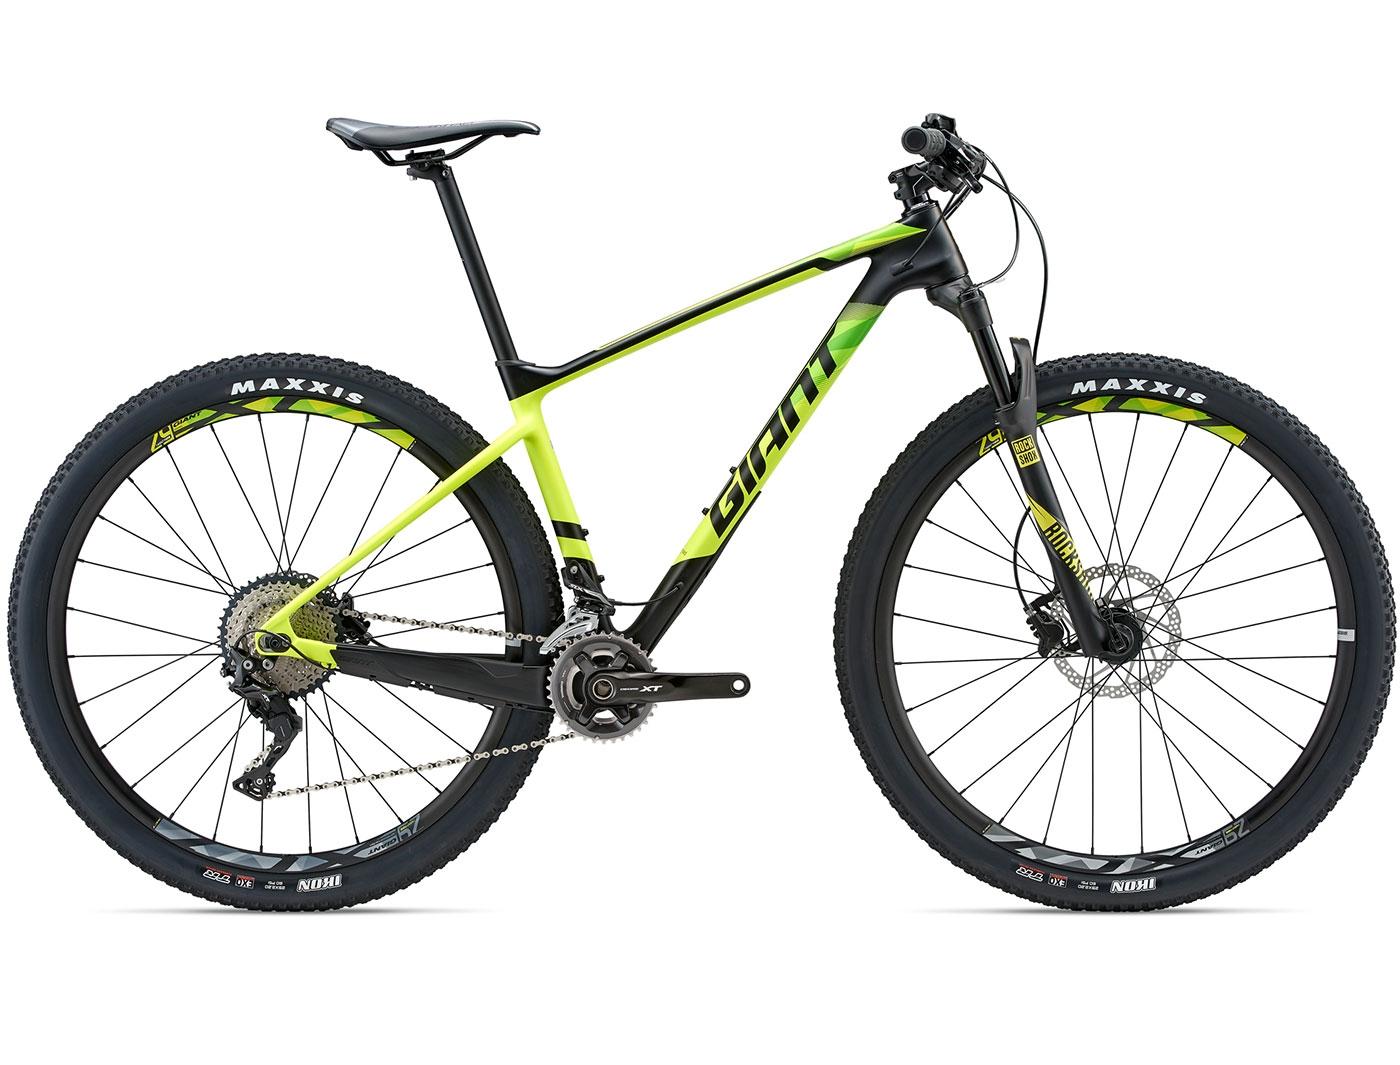 Велосипед Giant XTC Advanced 29er 2 GE (2018)